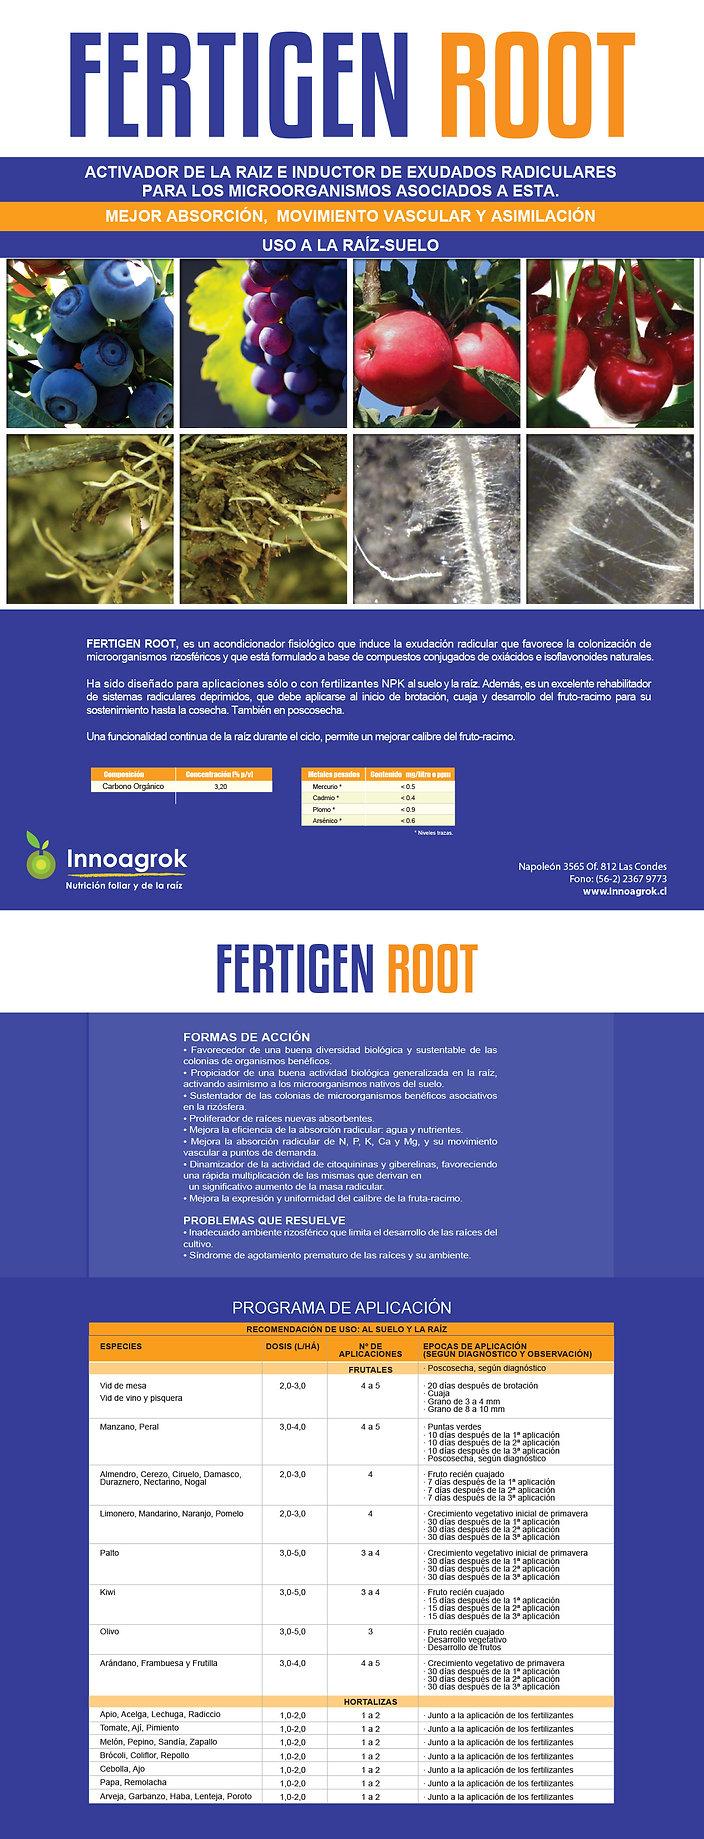 FT Fertigen Root.jpg